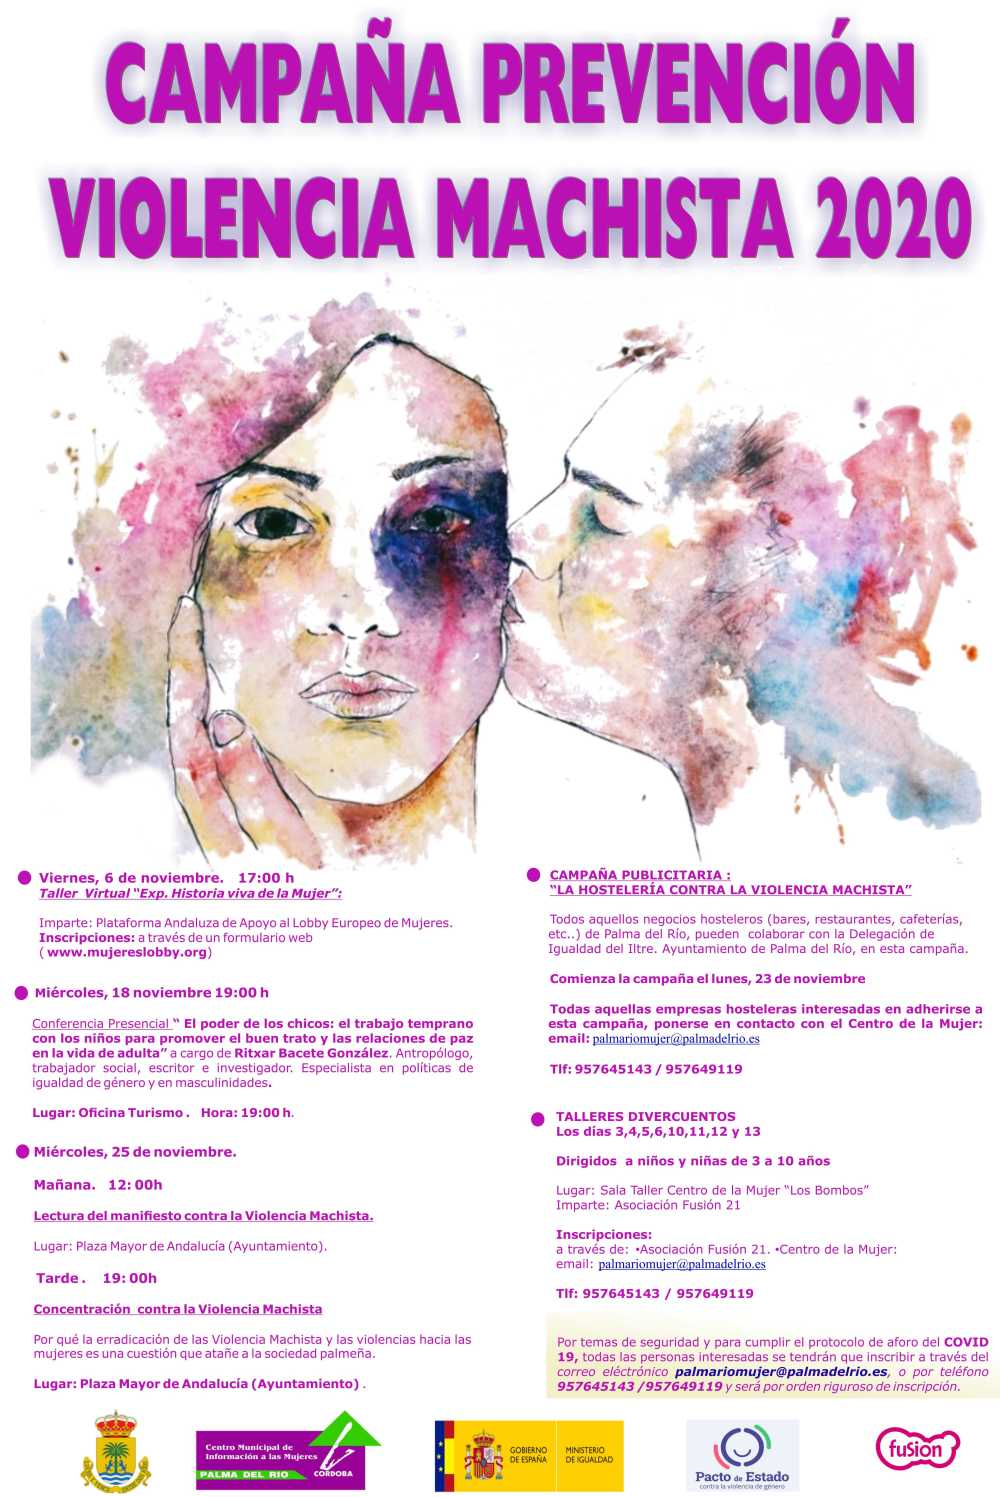 https://www.palmadelrio.es/sites/default/files/dia_de_la_mujercartel20.jpg